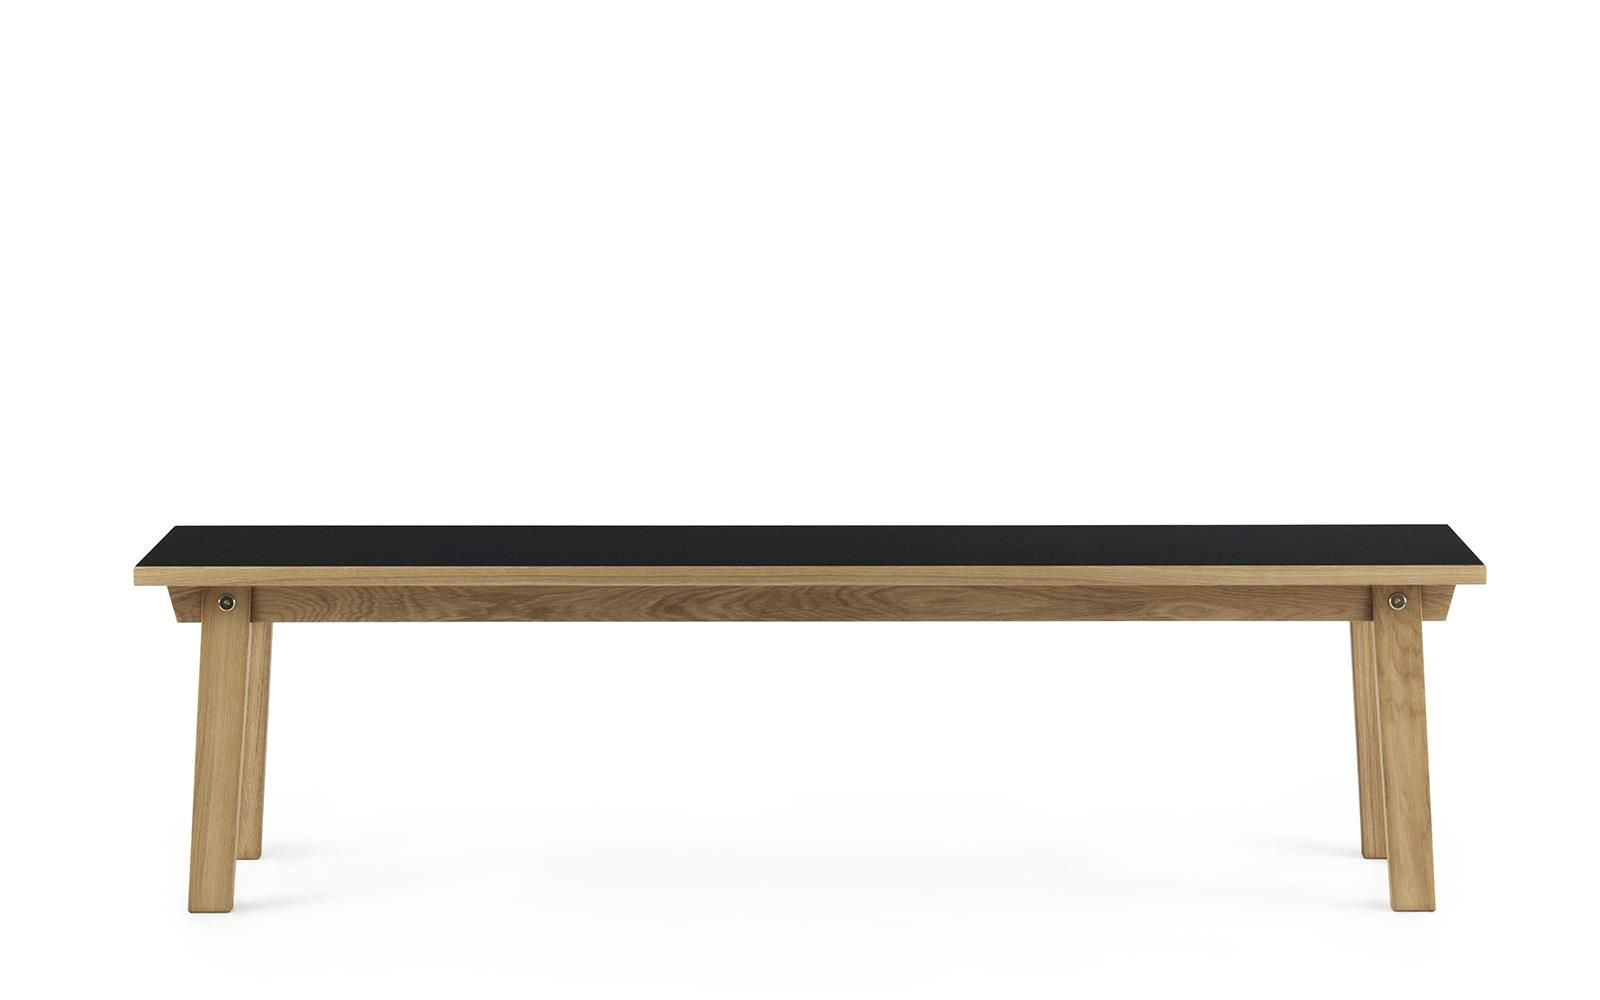 Slice Bench 38 X 160 Cm Linoleum In 2020 Bench Dining Bench Furniture